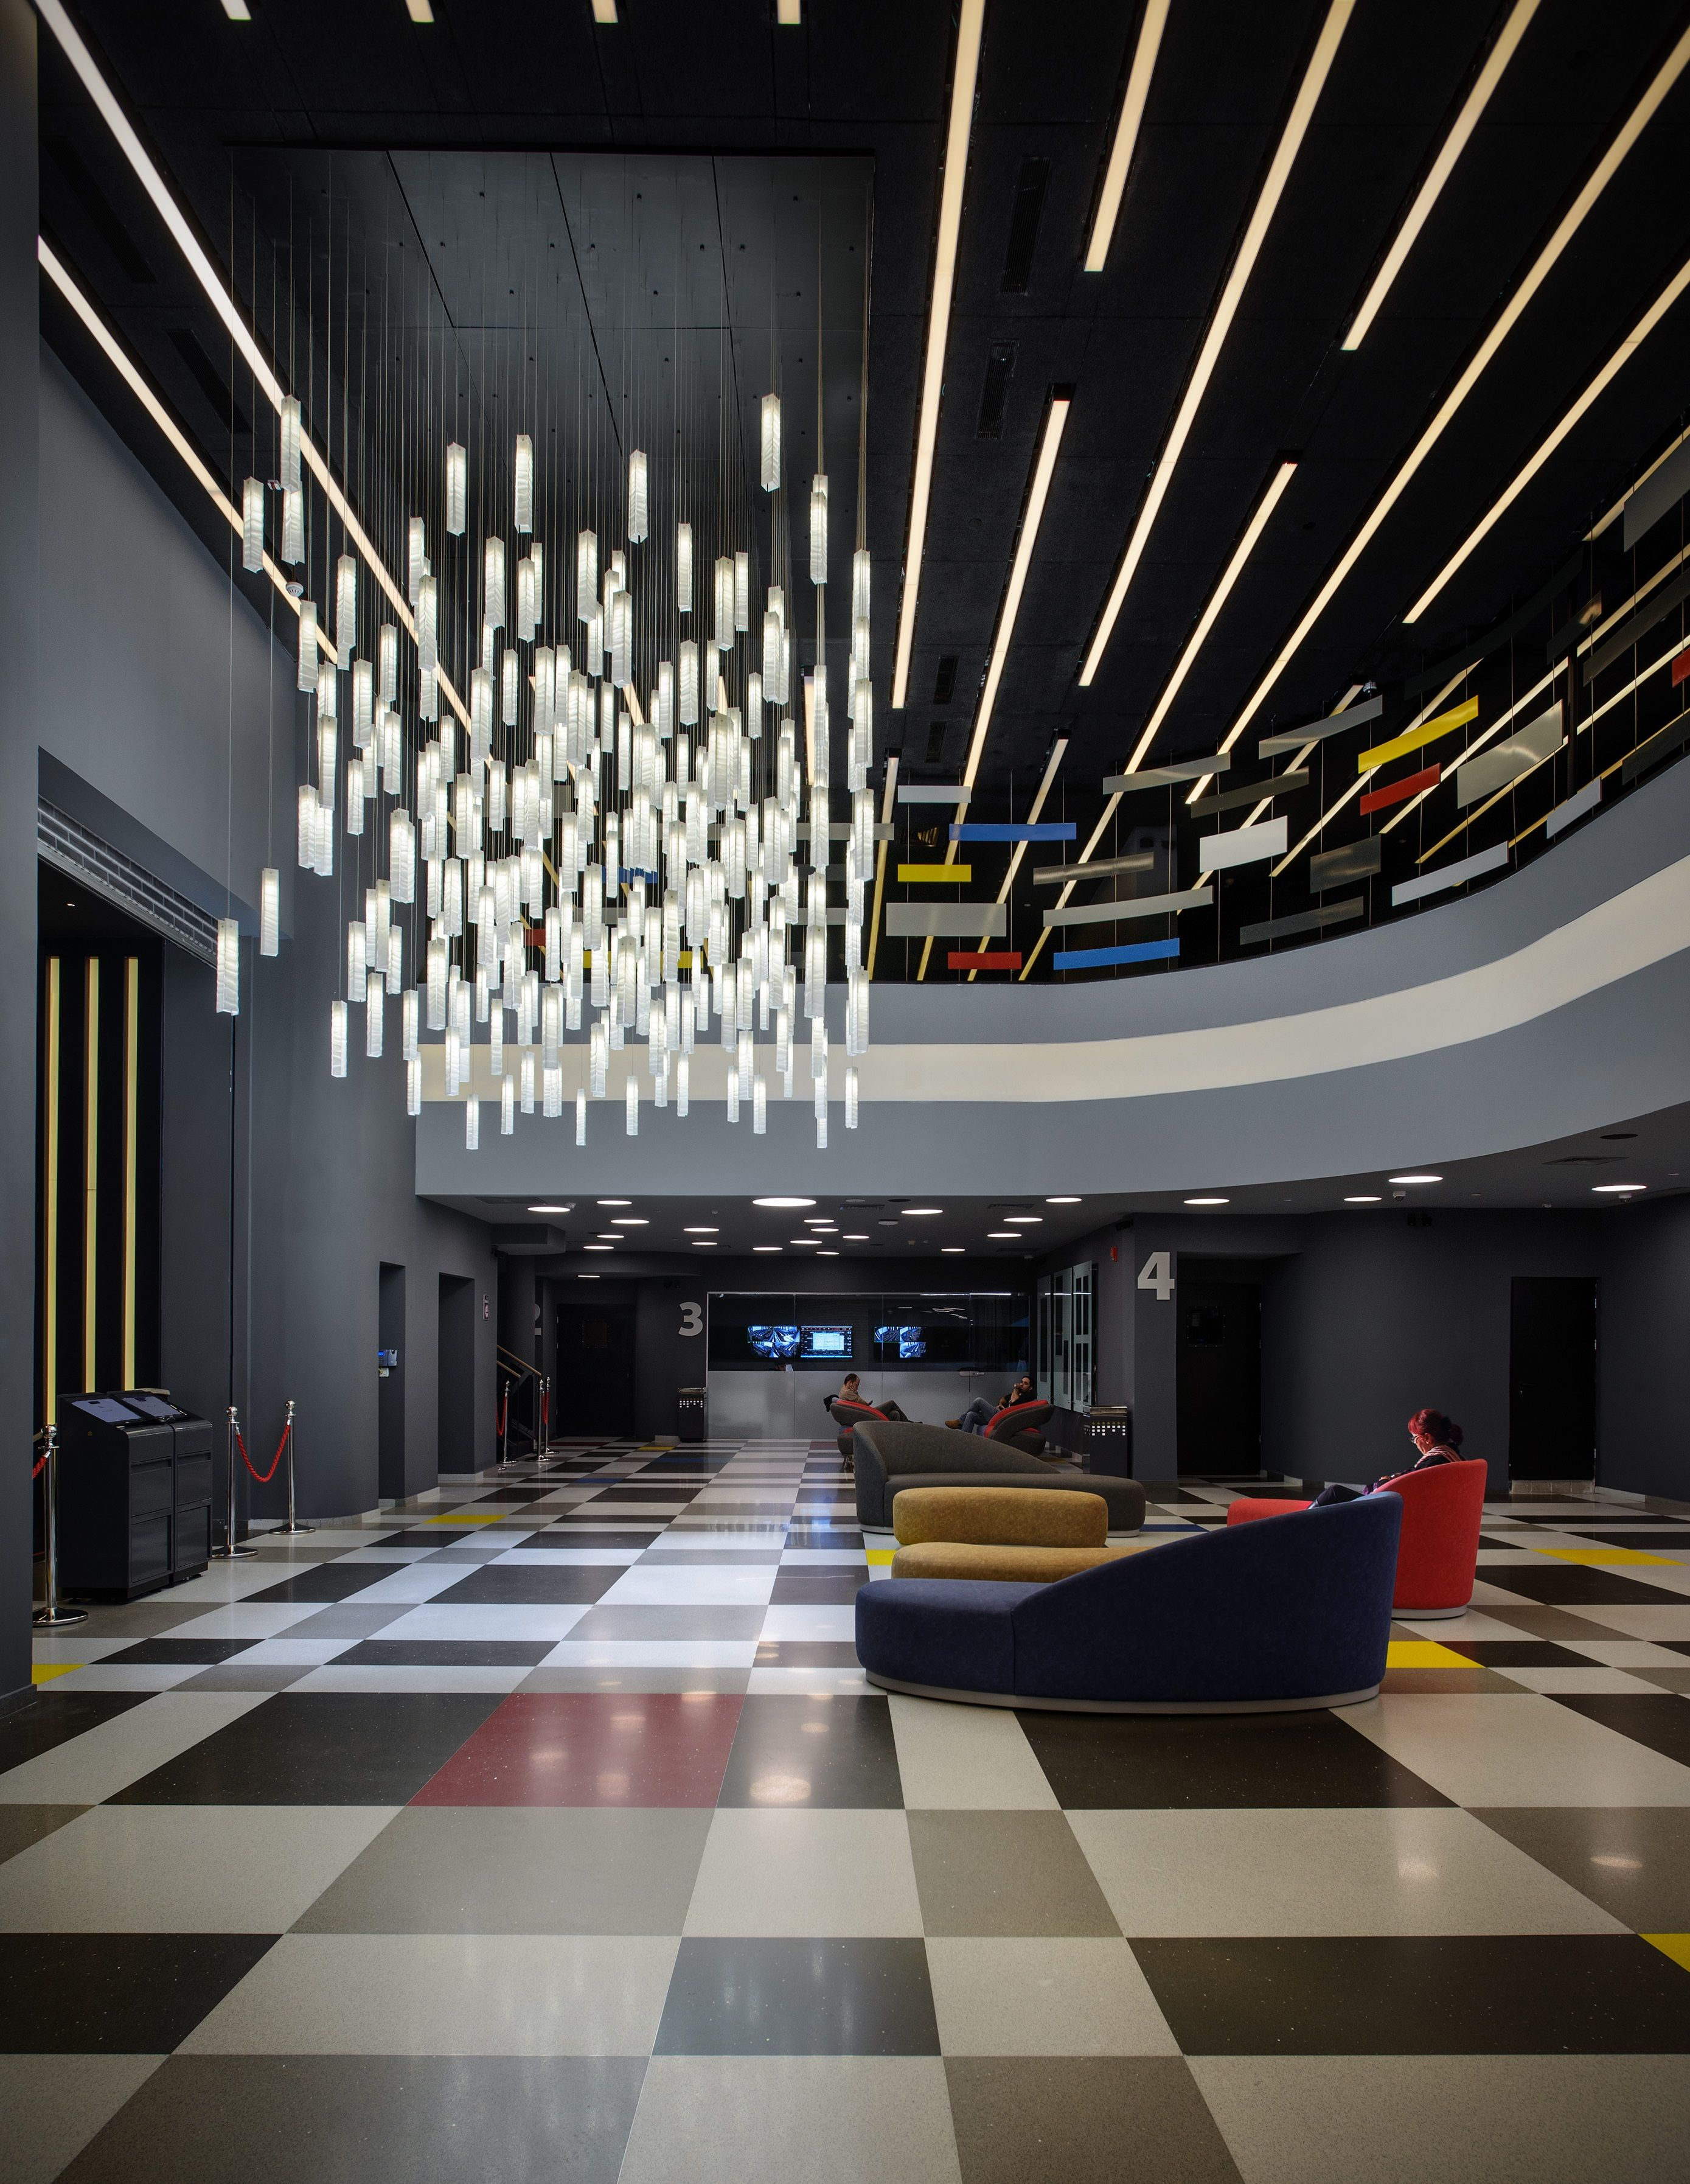 Circular Led Pendant Above Reception Desk Lobby Interior Design Hotel Lobby Design Office Reception Design